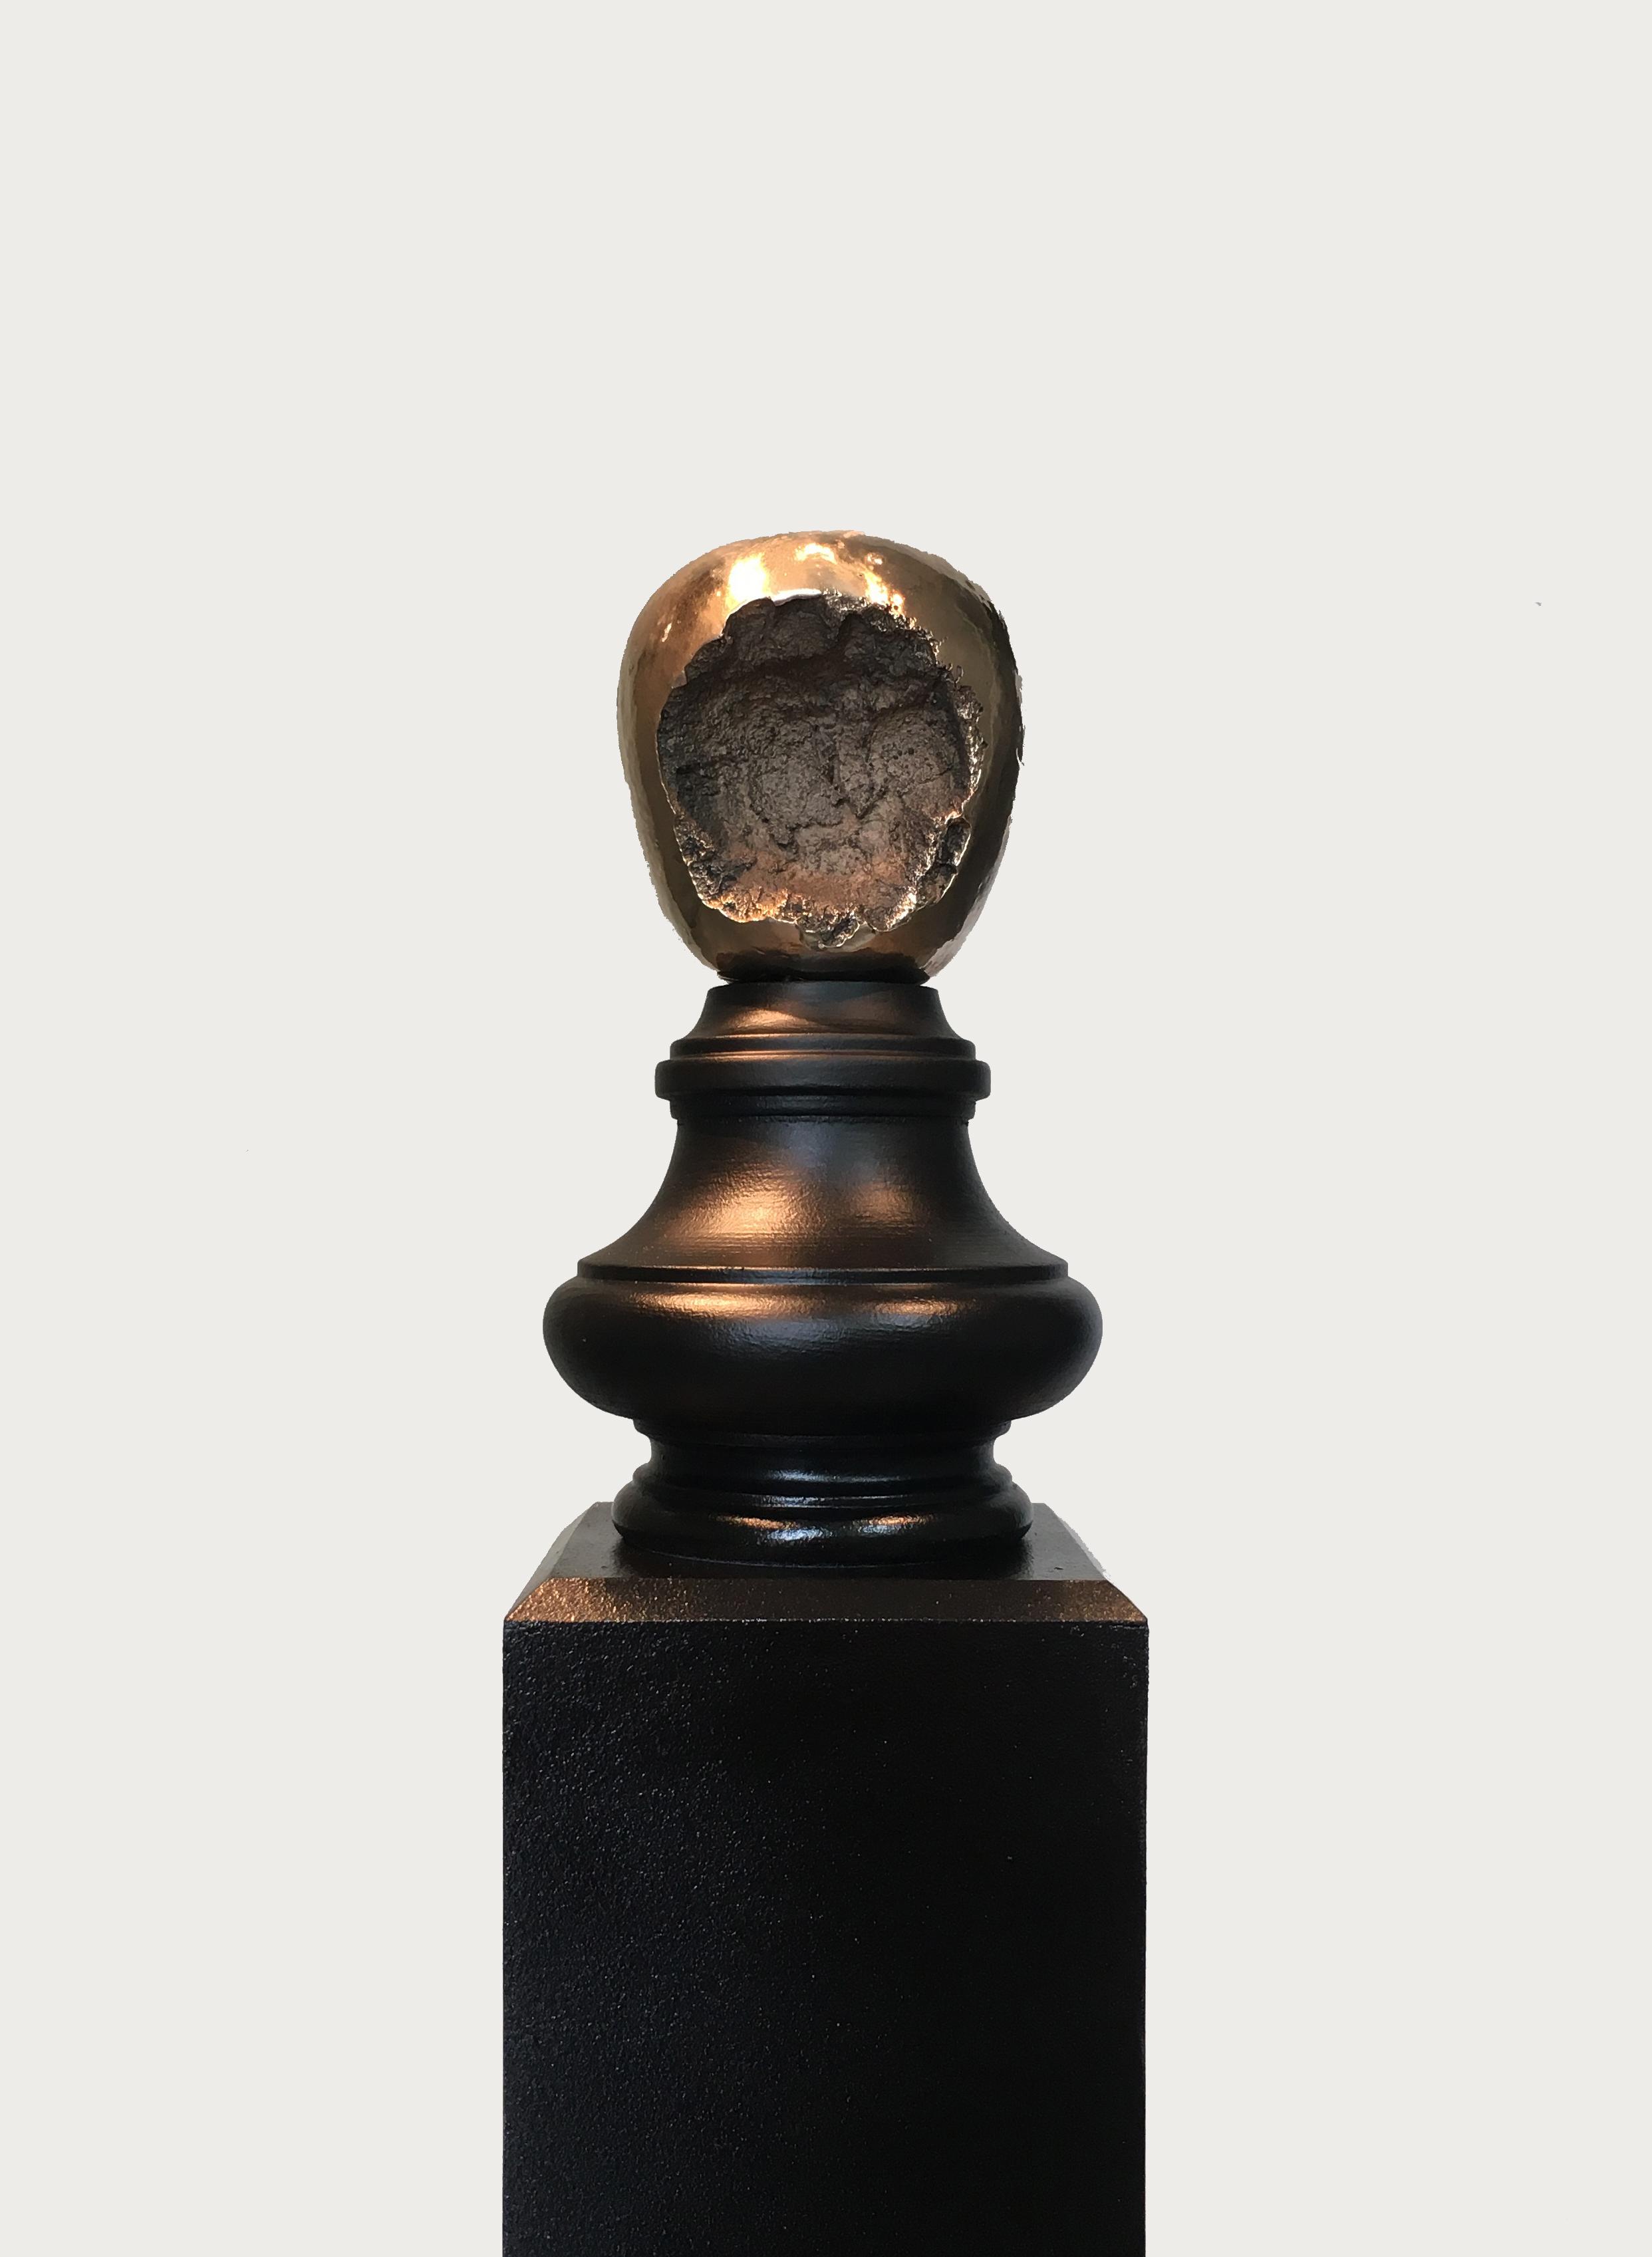 Siyuan Tan,  It Began to Rot Around the Wound , 2018. Copper, wood, 4 x 4 x 3 inch; Base: 45 x 4 x 4 inch ©Siyuan Tan, courtesy Fou Gallery